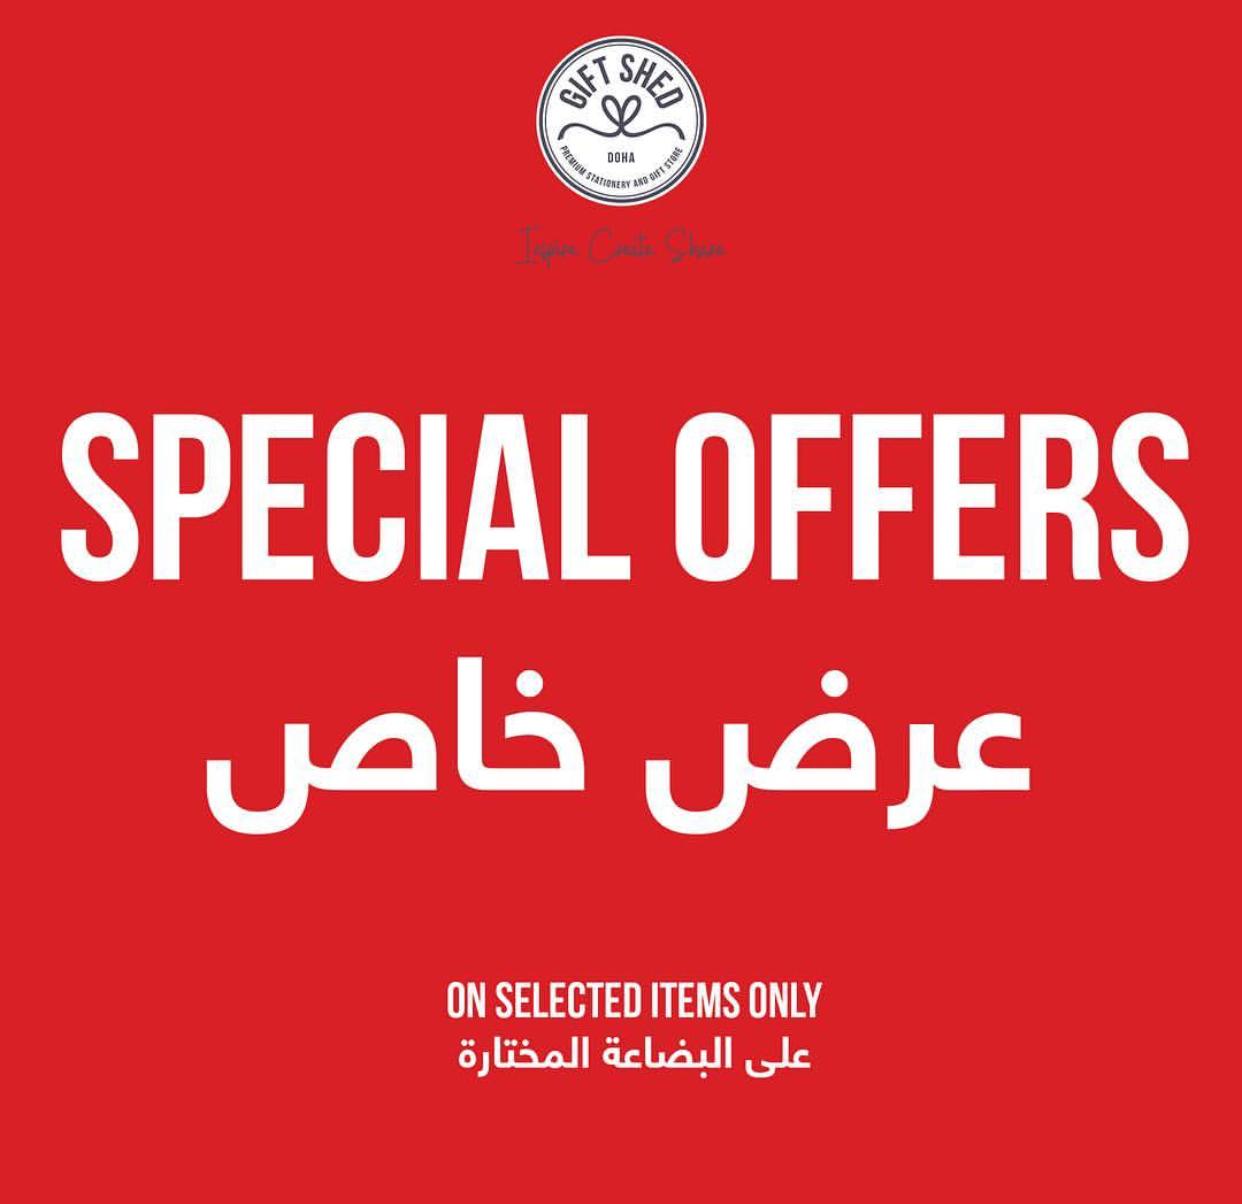 latest offers - malls